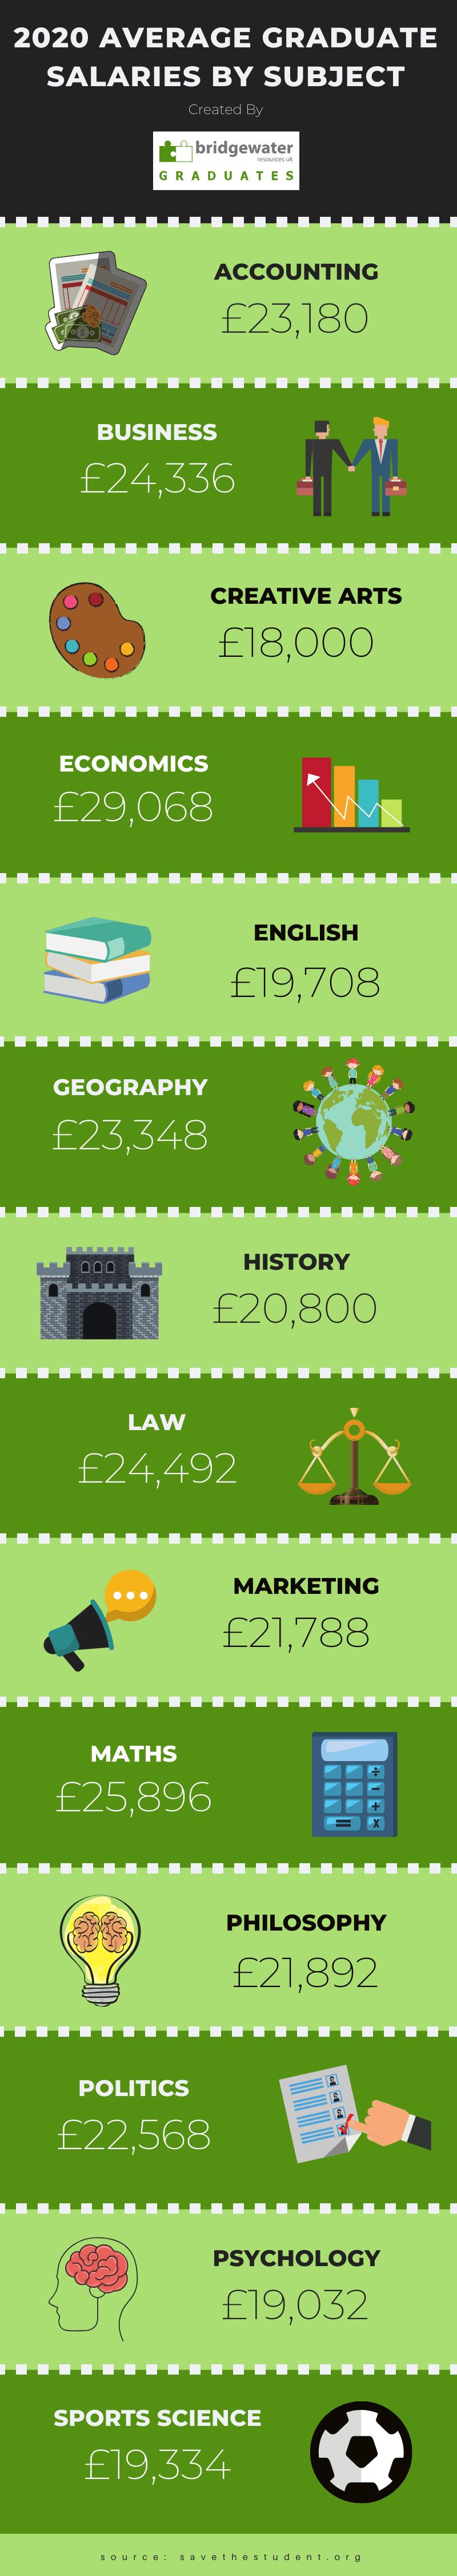 average graduate salary 2020 uk